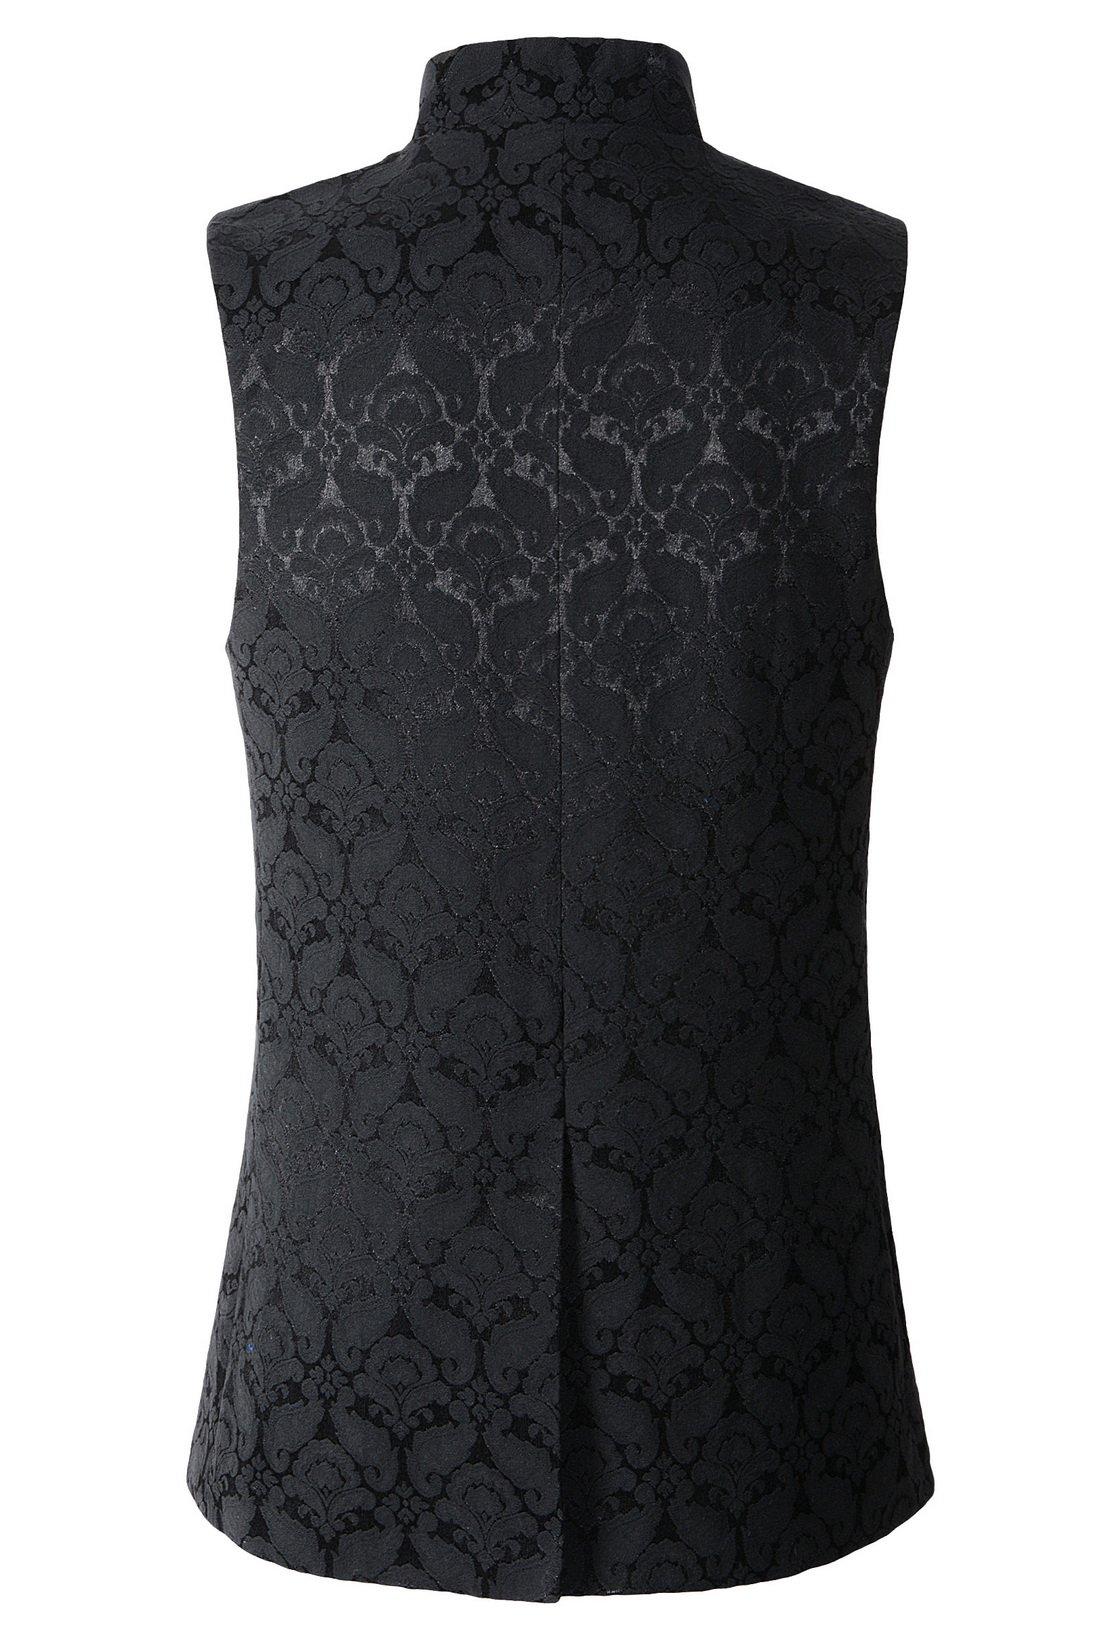 DarcChic Mens Gothic Steampunk Vest Waistcoat Victorian Damask Stand-up Collar Tailcoat 4